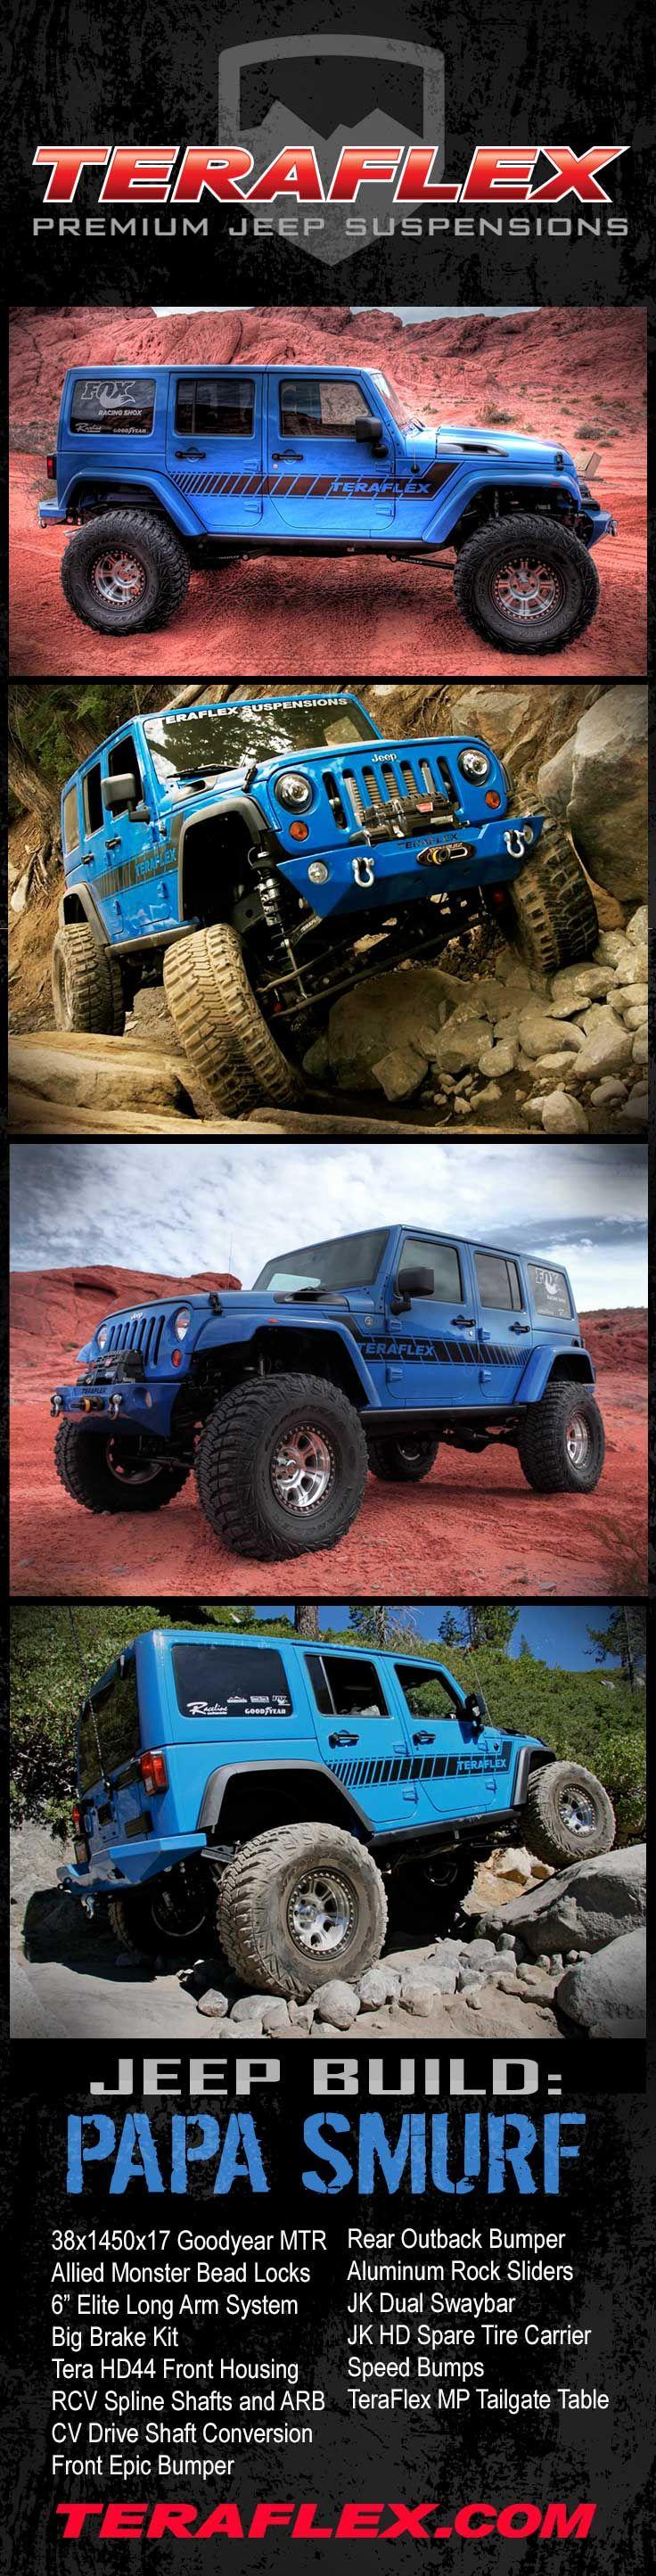 #TeraFlex Jeep Build, Papa Smurf: https://teraflex.com/galleries/550b3e2dd0b0de01f5000002